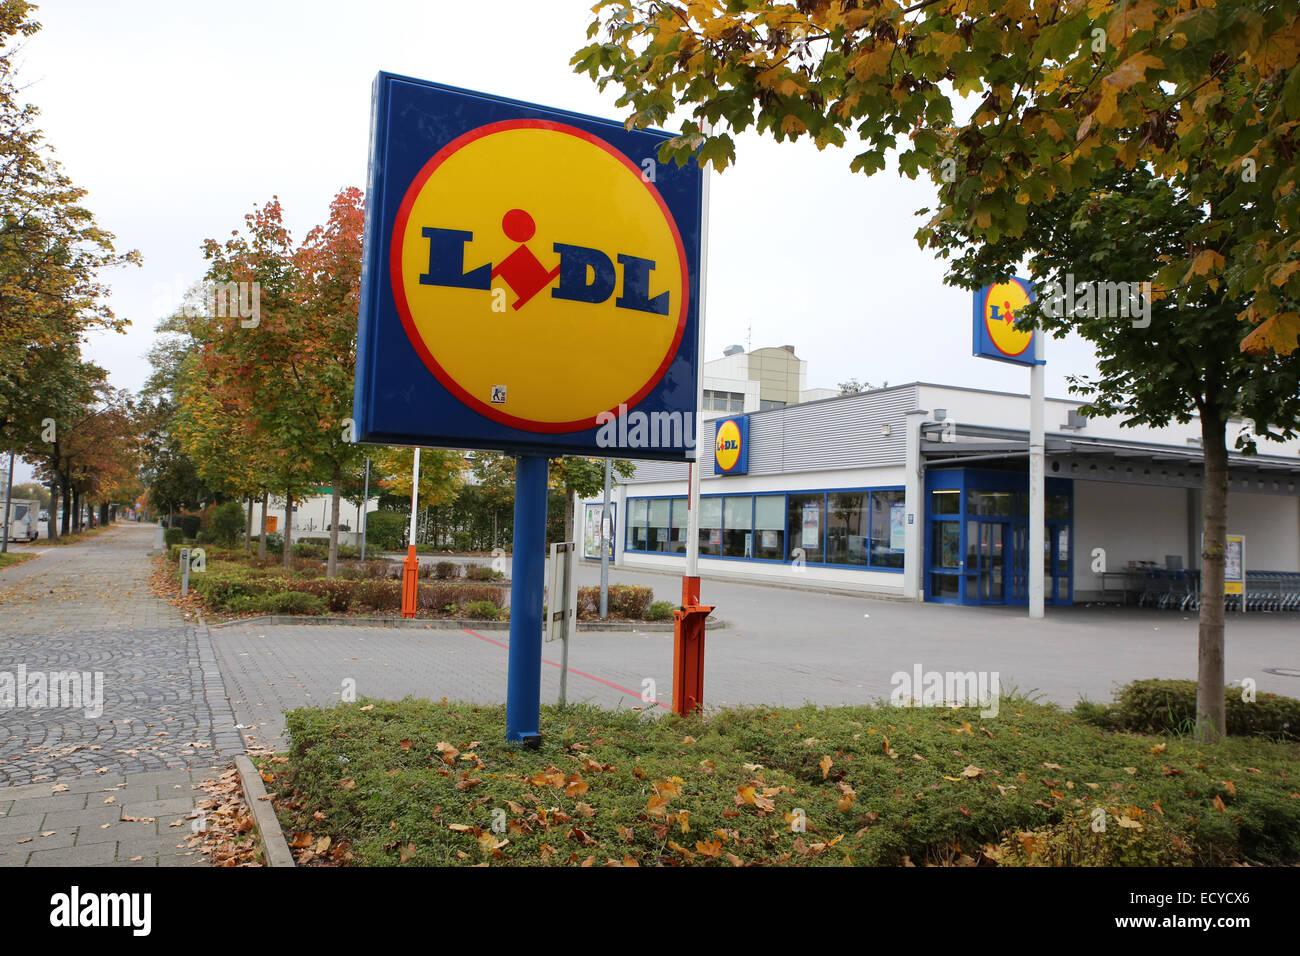 lidl supermarket store germany munich europe Stock Photo